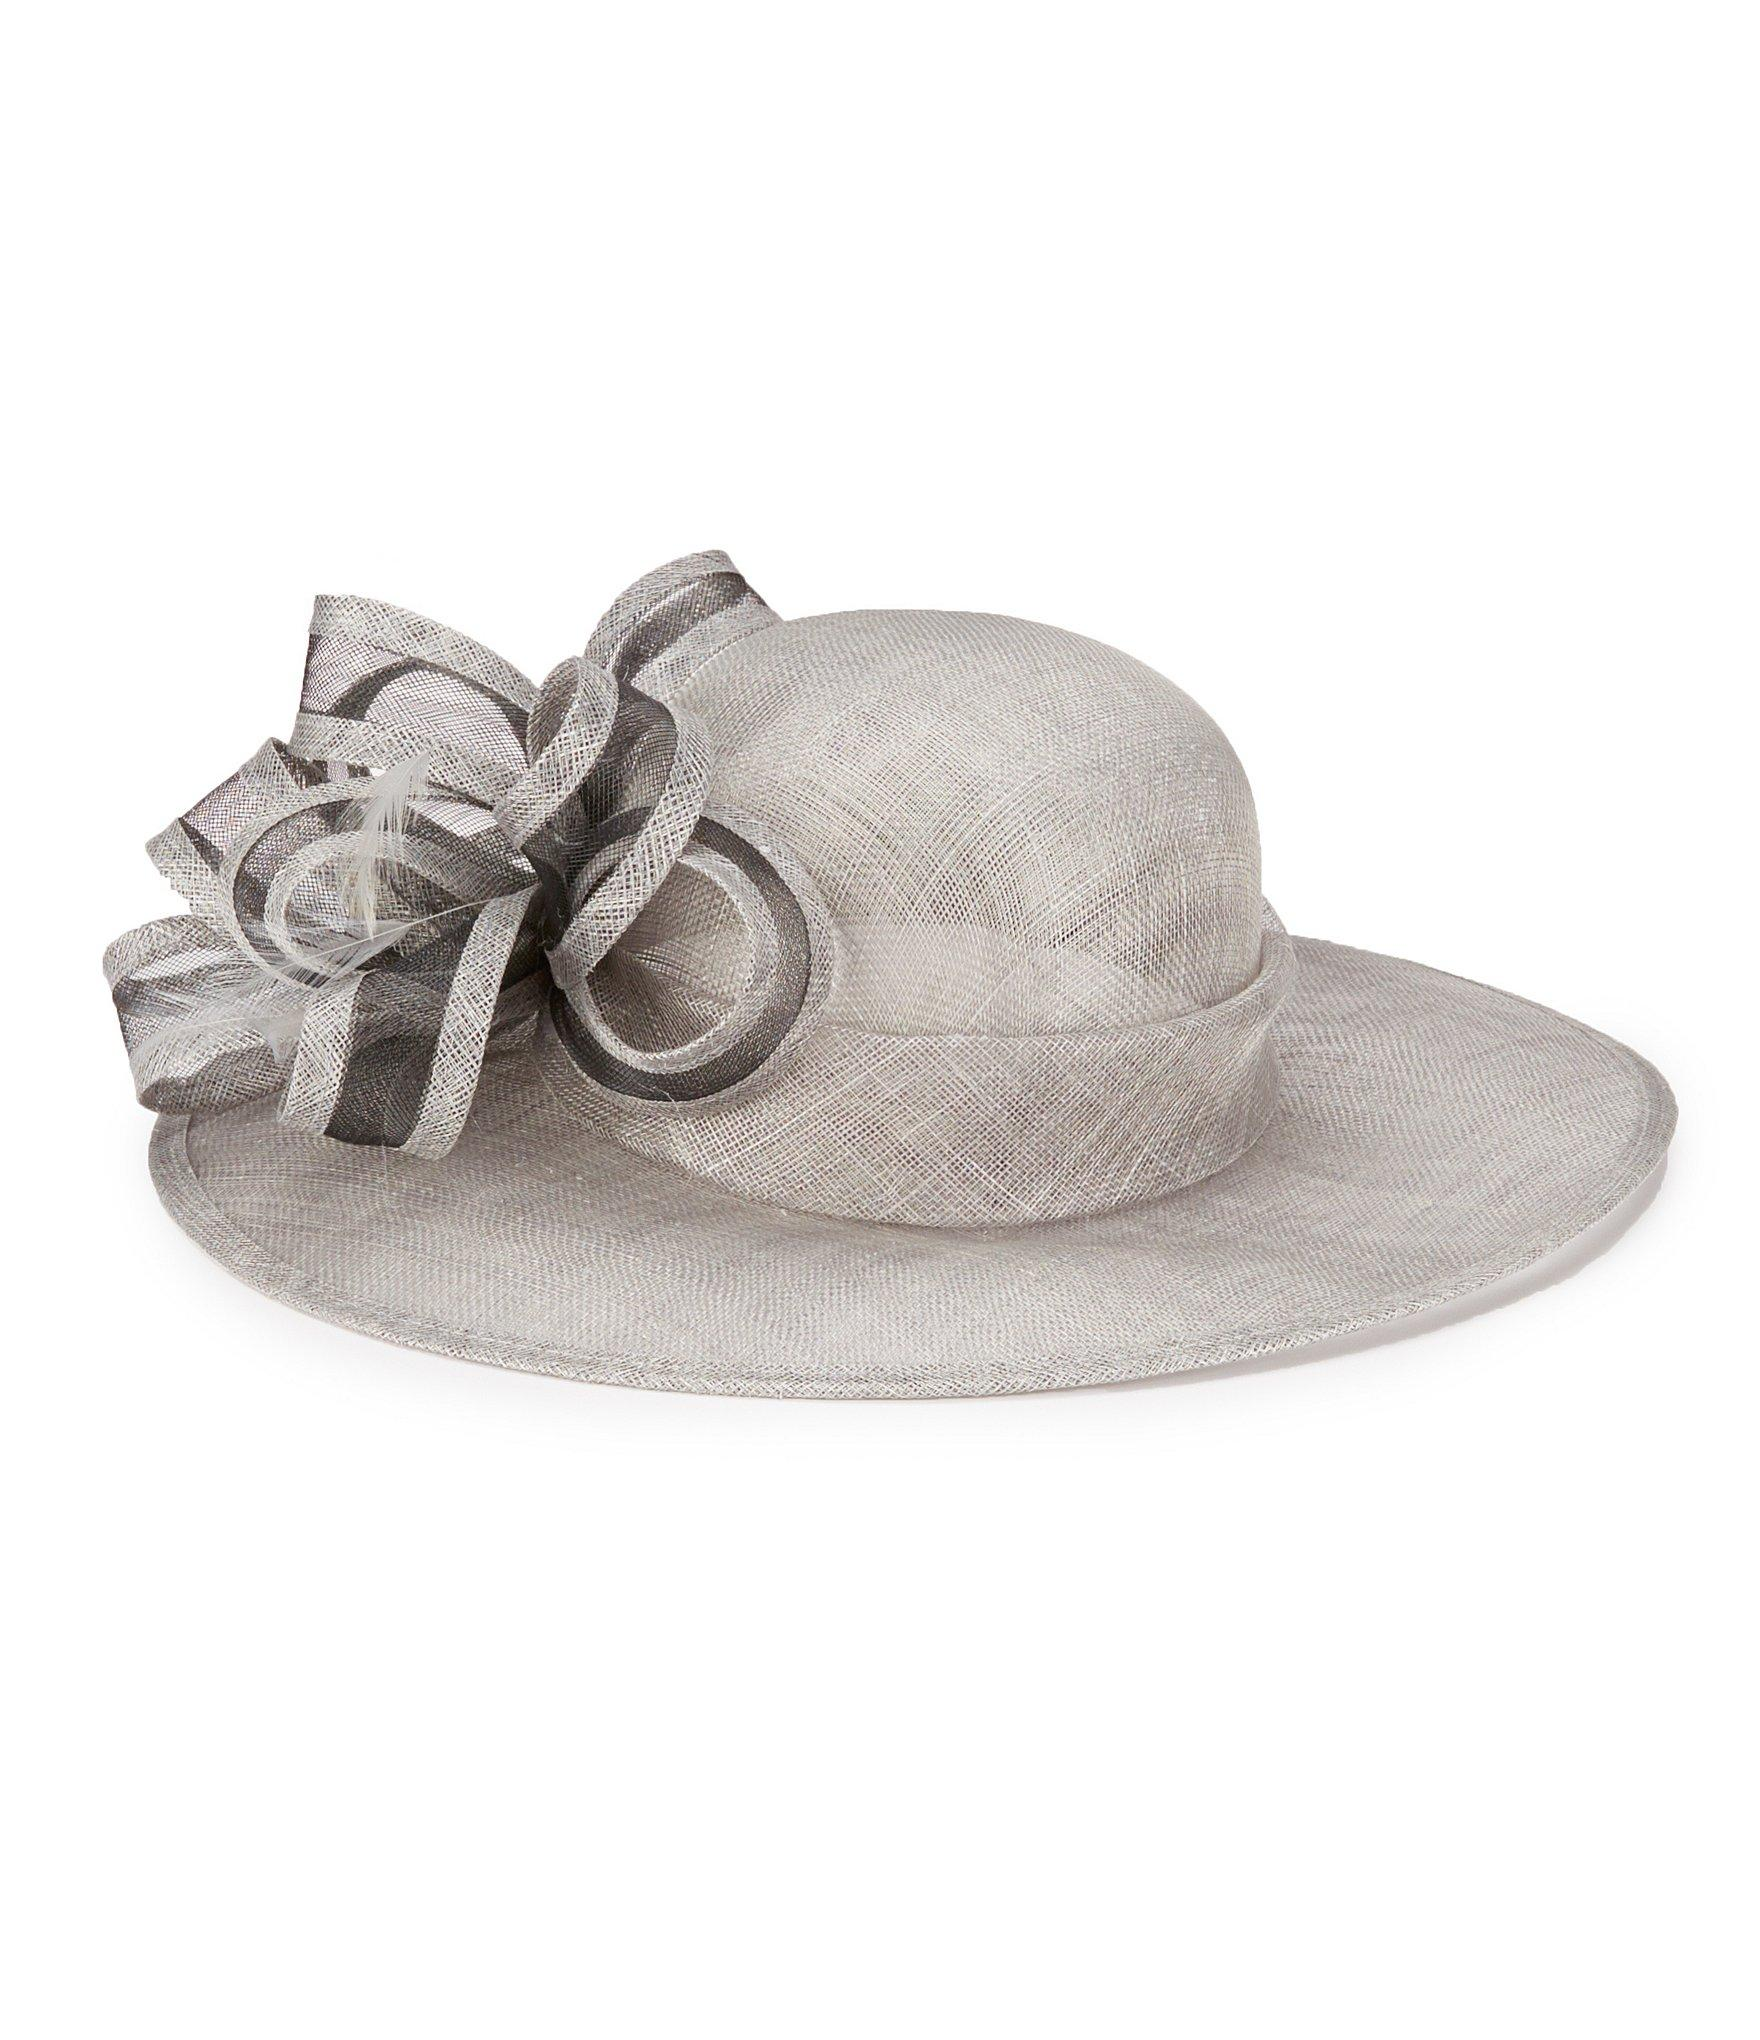 august accessories gardenia sinamay dress hat in gray lyst